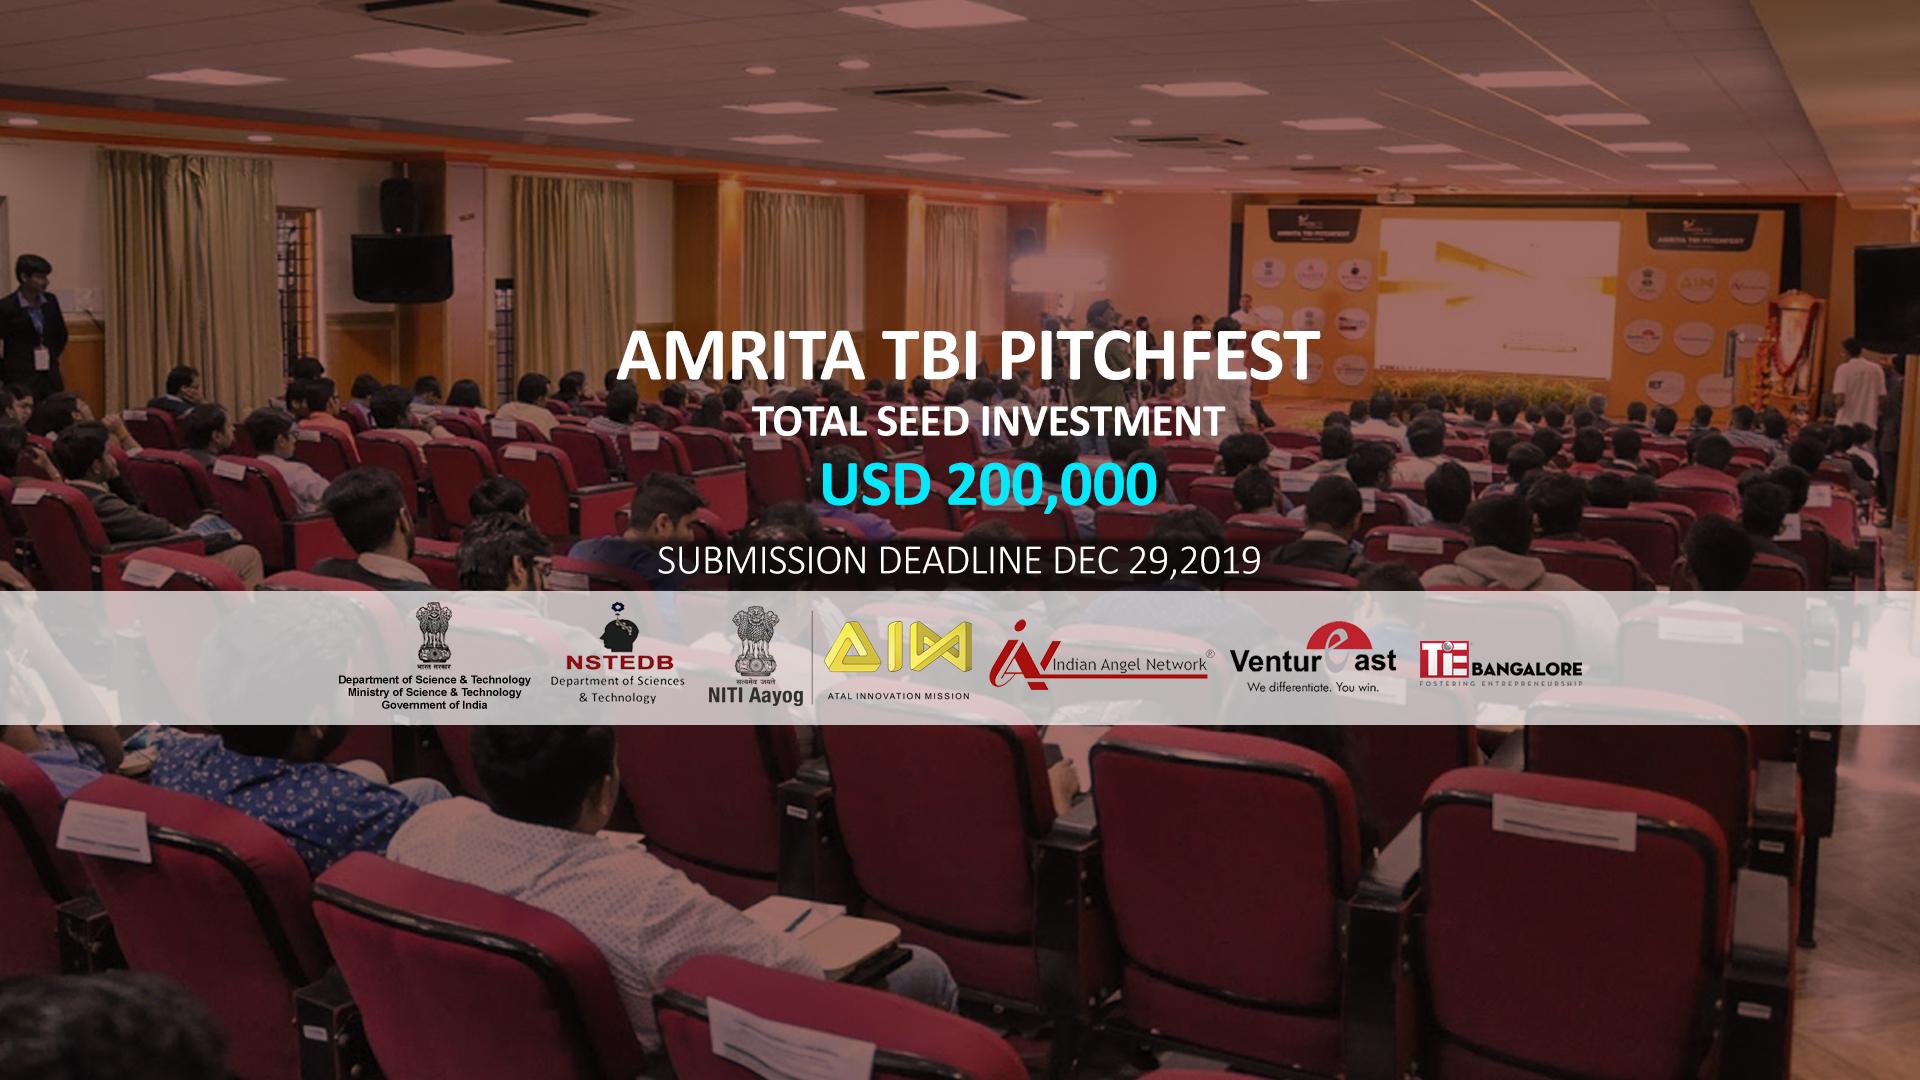 Amrita TBI Pitchfest 2019